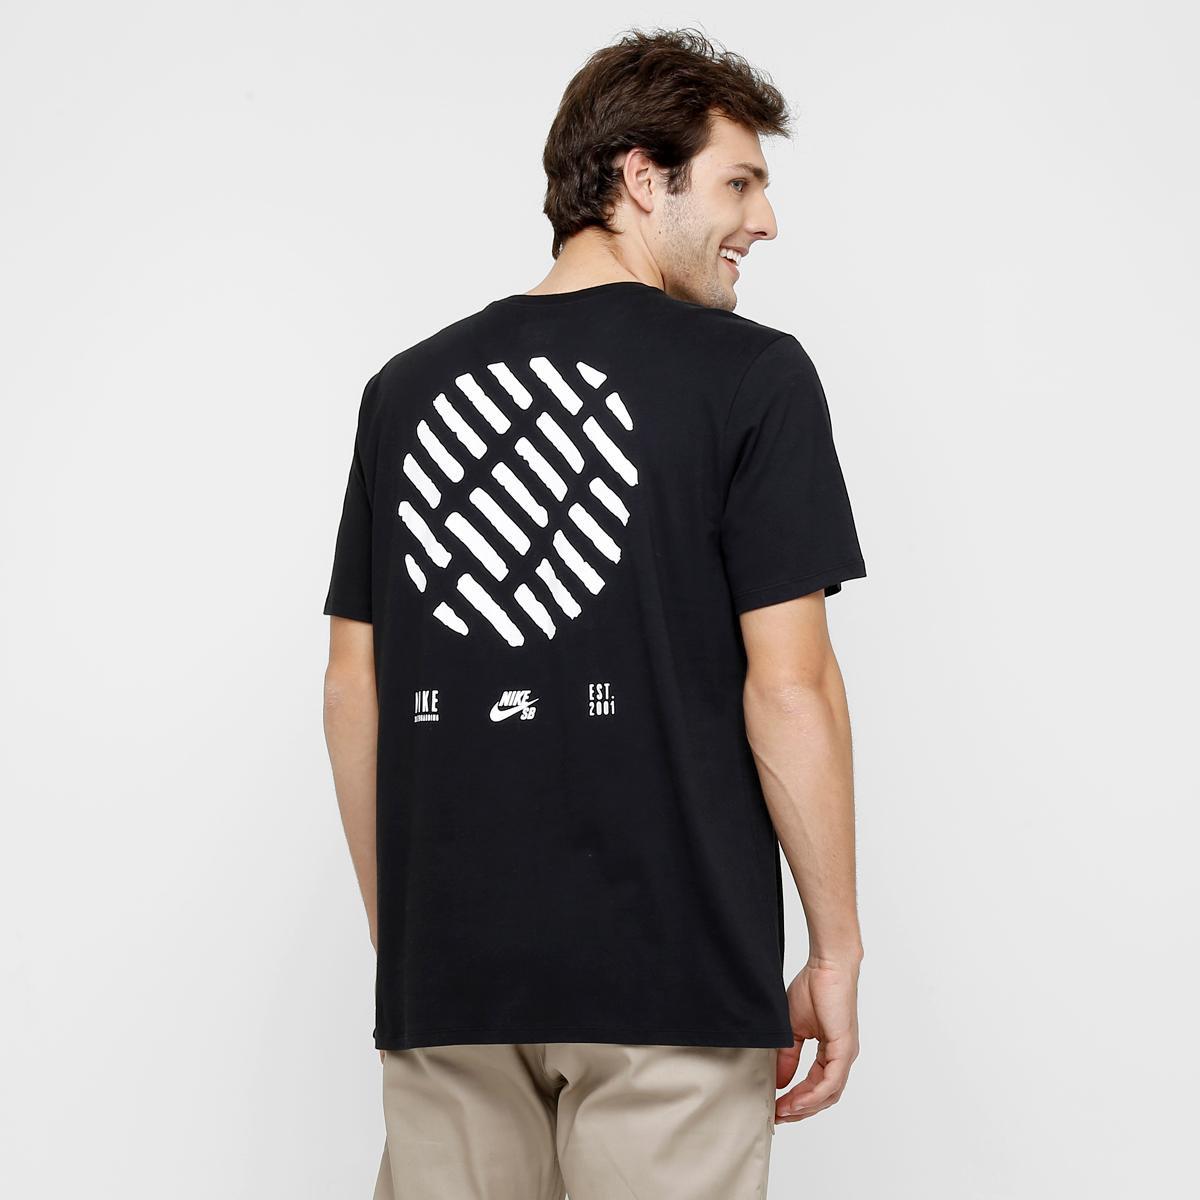 536892d8c6 Camiseta Nike Sb Sewer  Camiseta Nike Sb Sewer ...